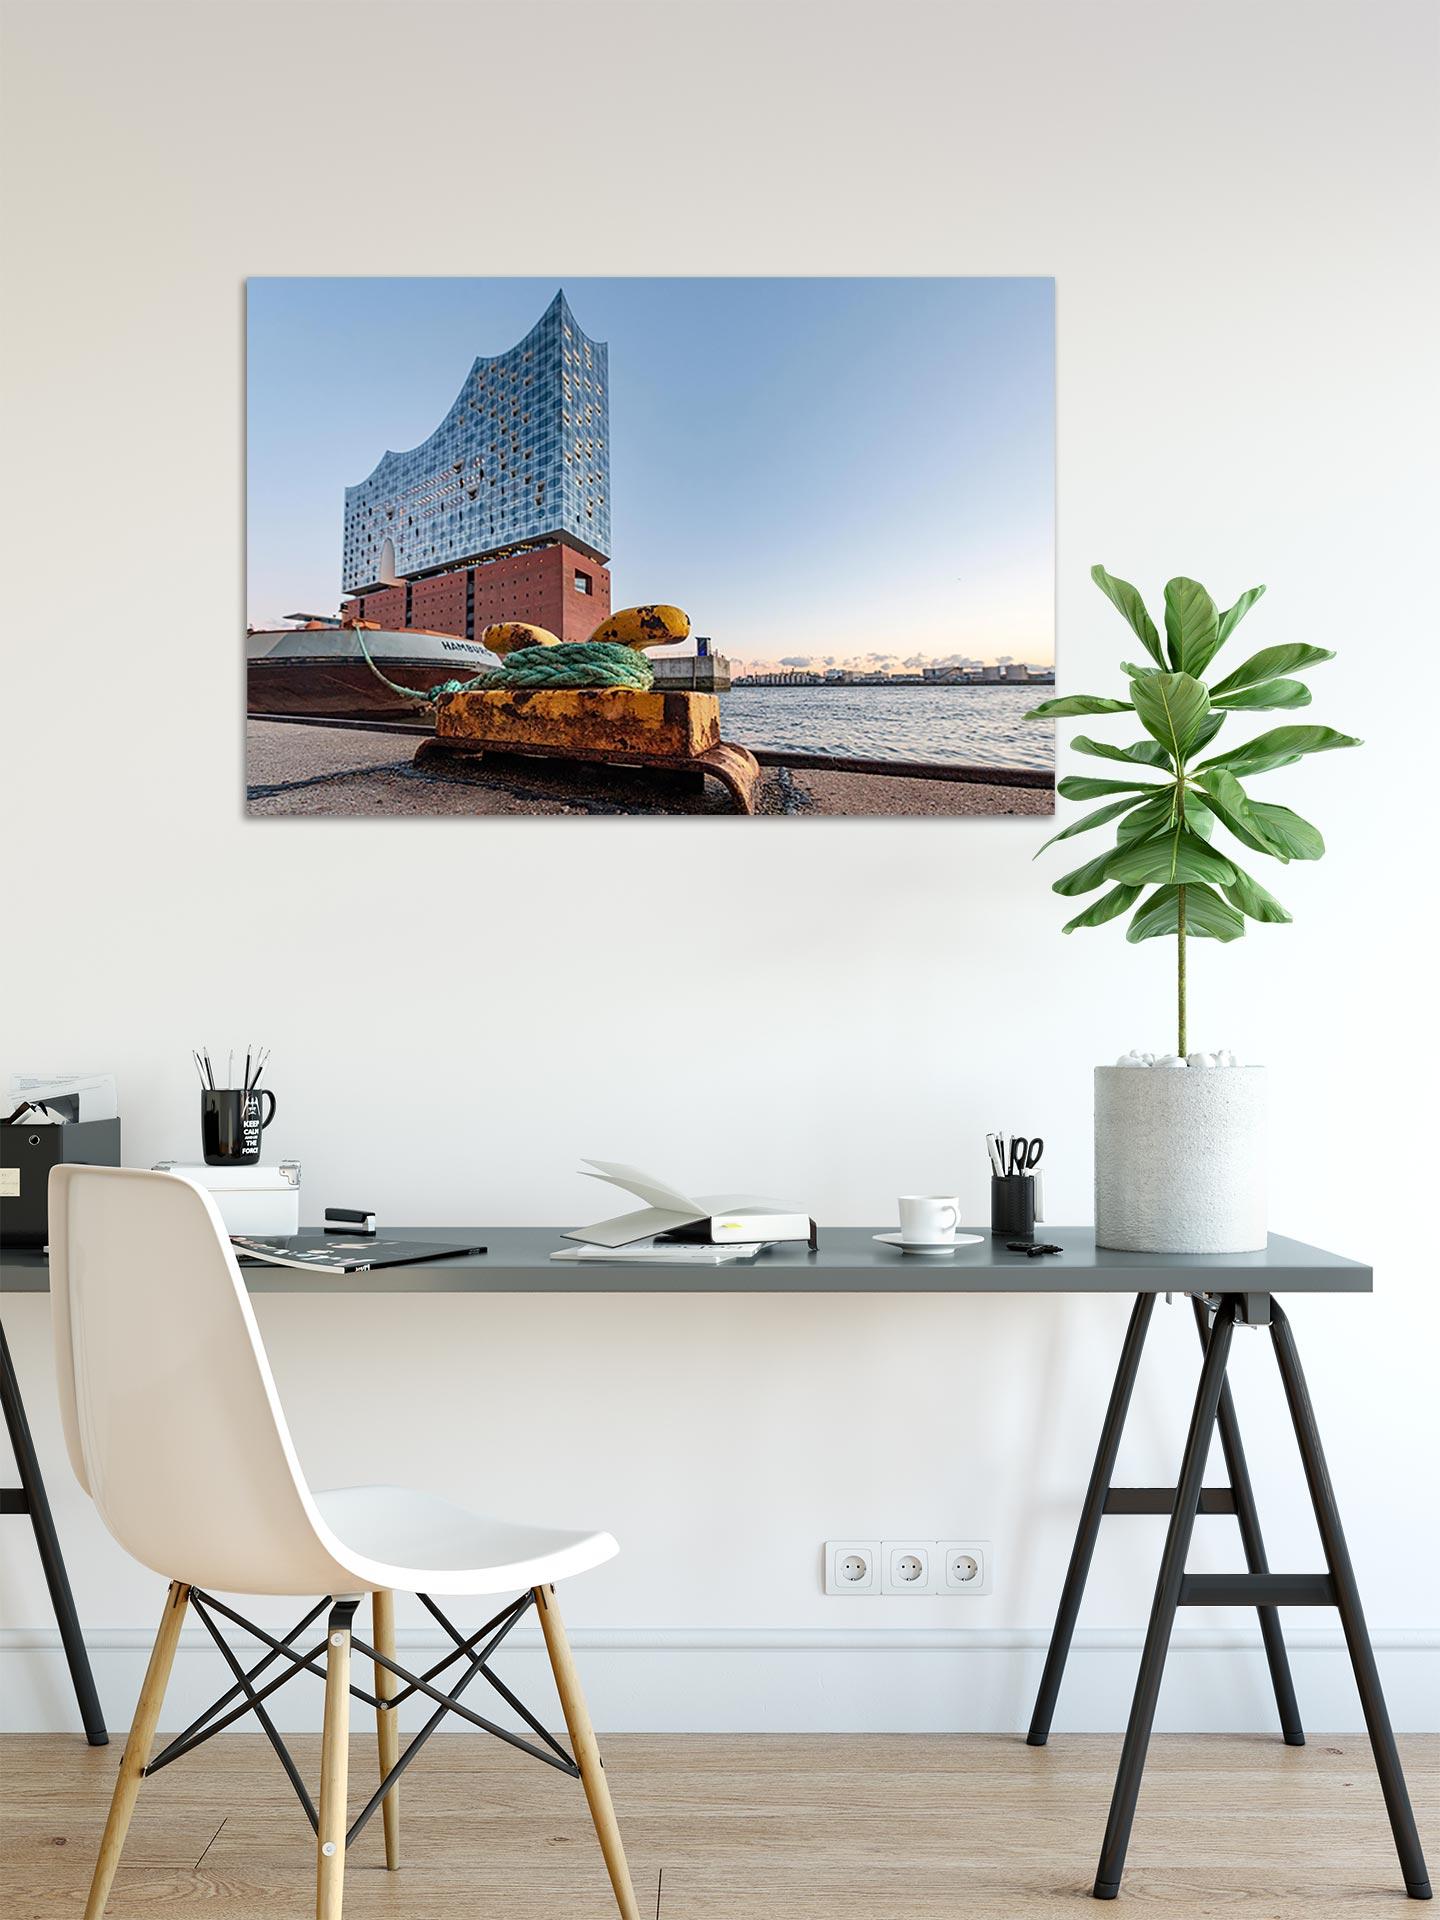 NL085-elphi-klampe-hamburg-wandbild-bild-auf-leinwand-acrylglas-aludibond-arbeitszimmer